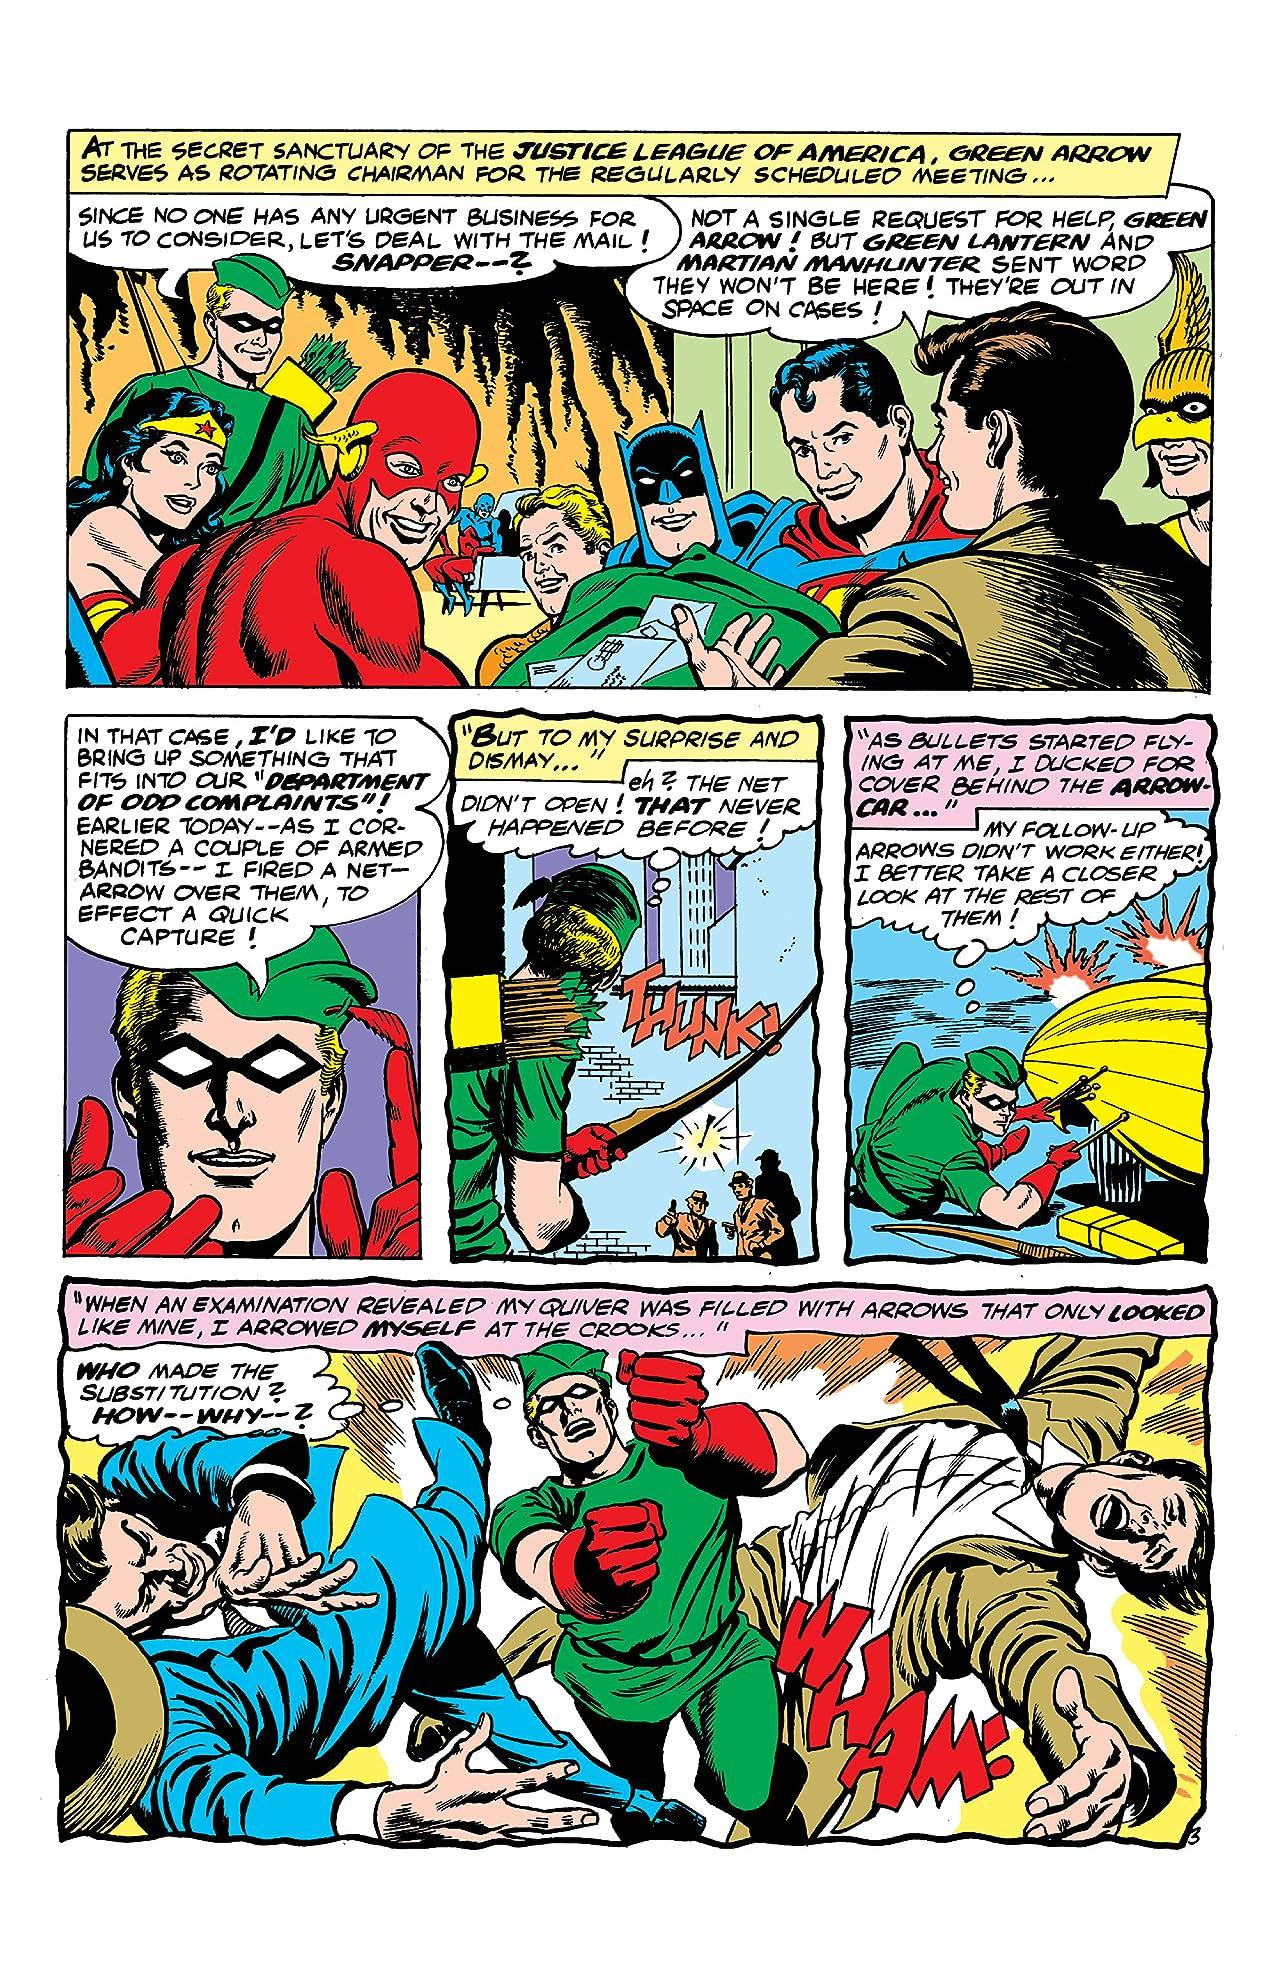 Justice League of America (1960-1987) #53